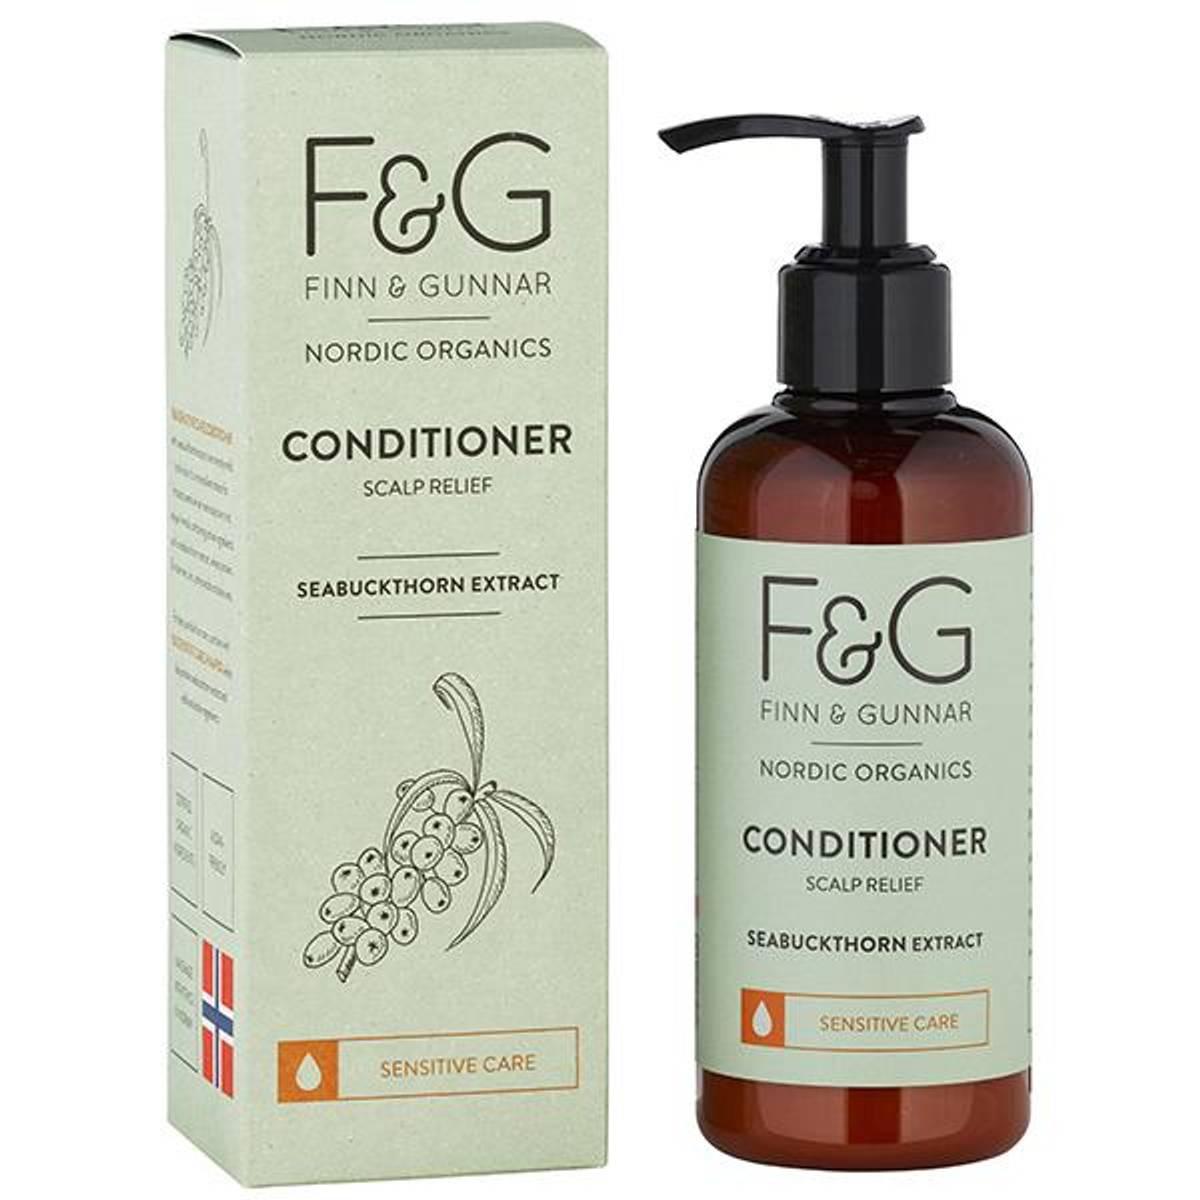 F&G Nordic Organics Conditioner Scalp Relief 200 ml